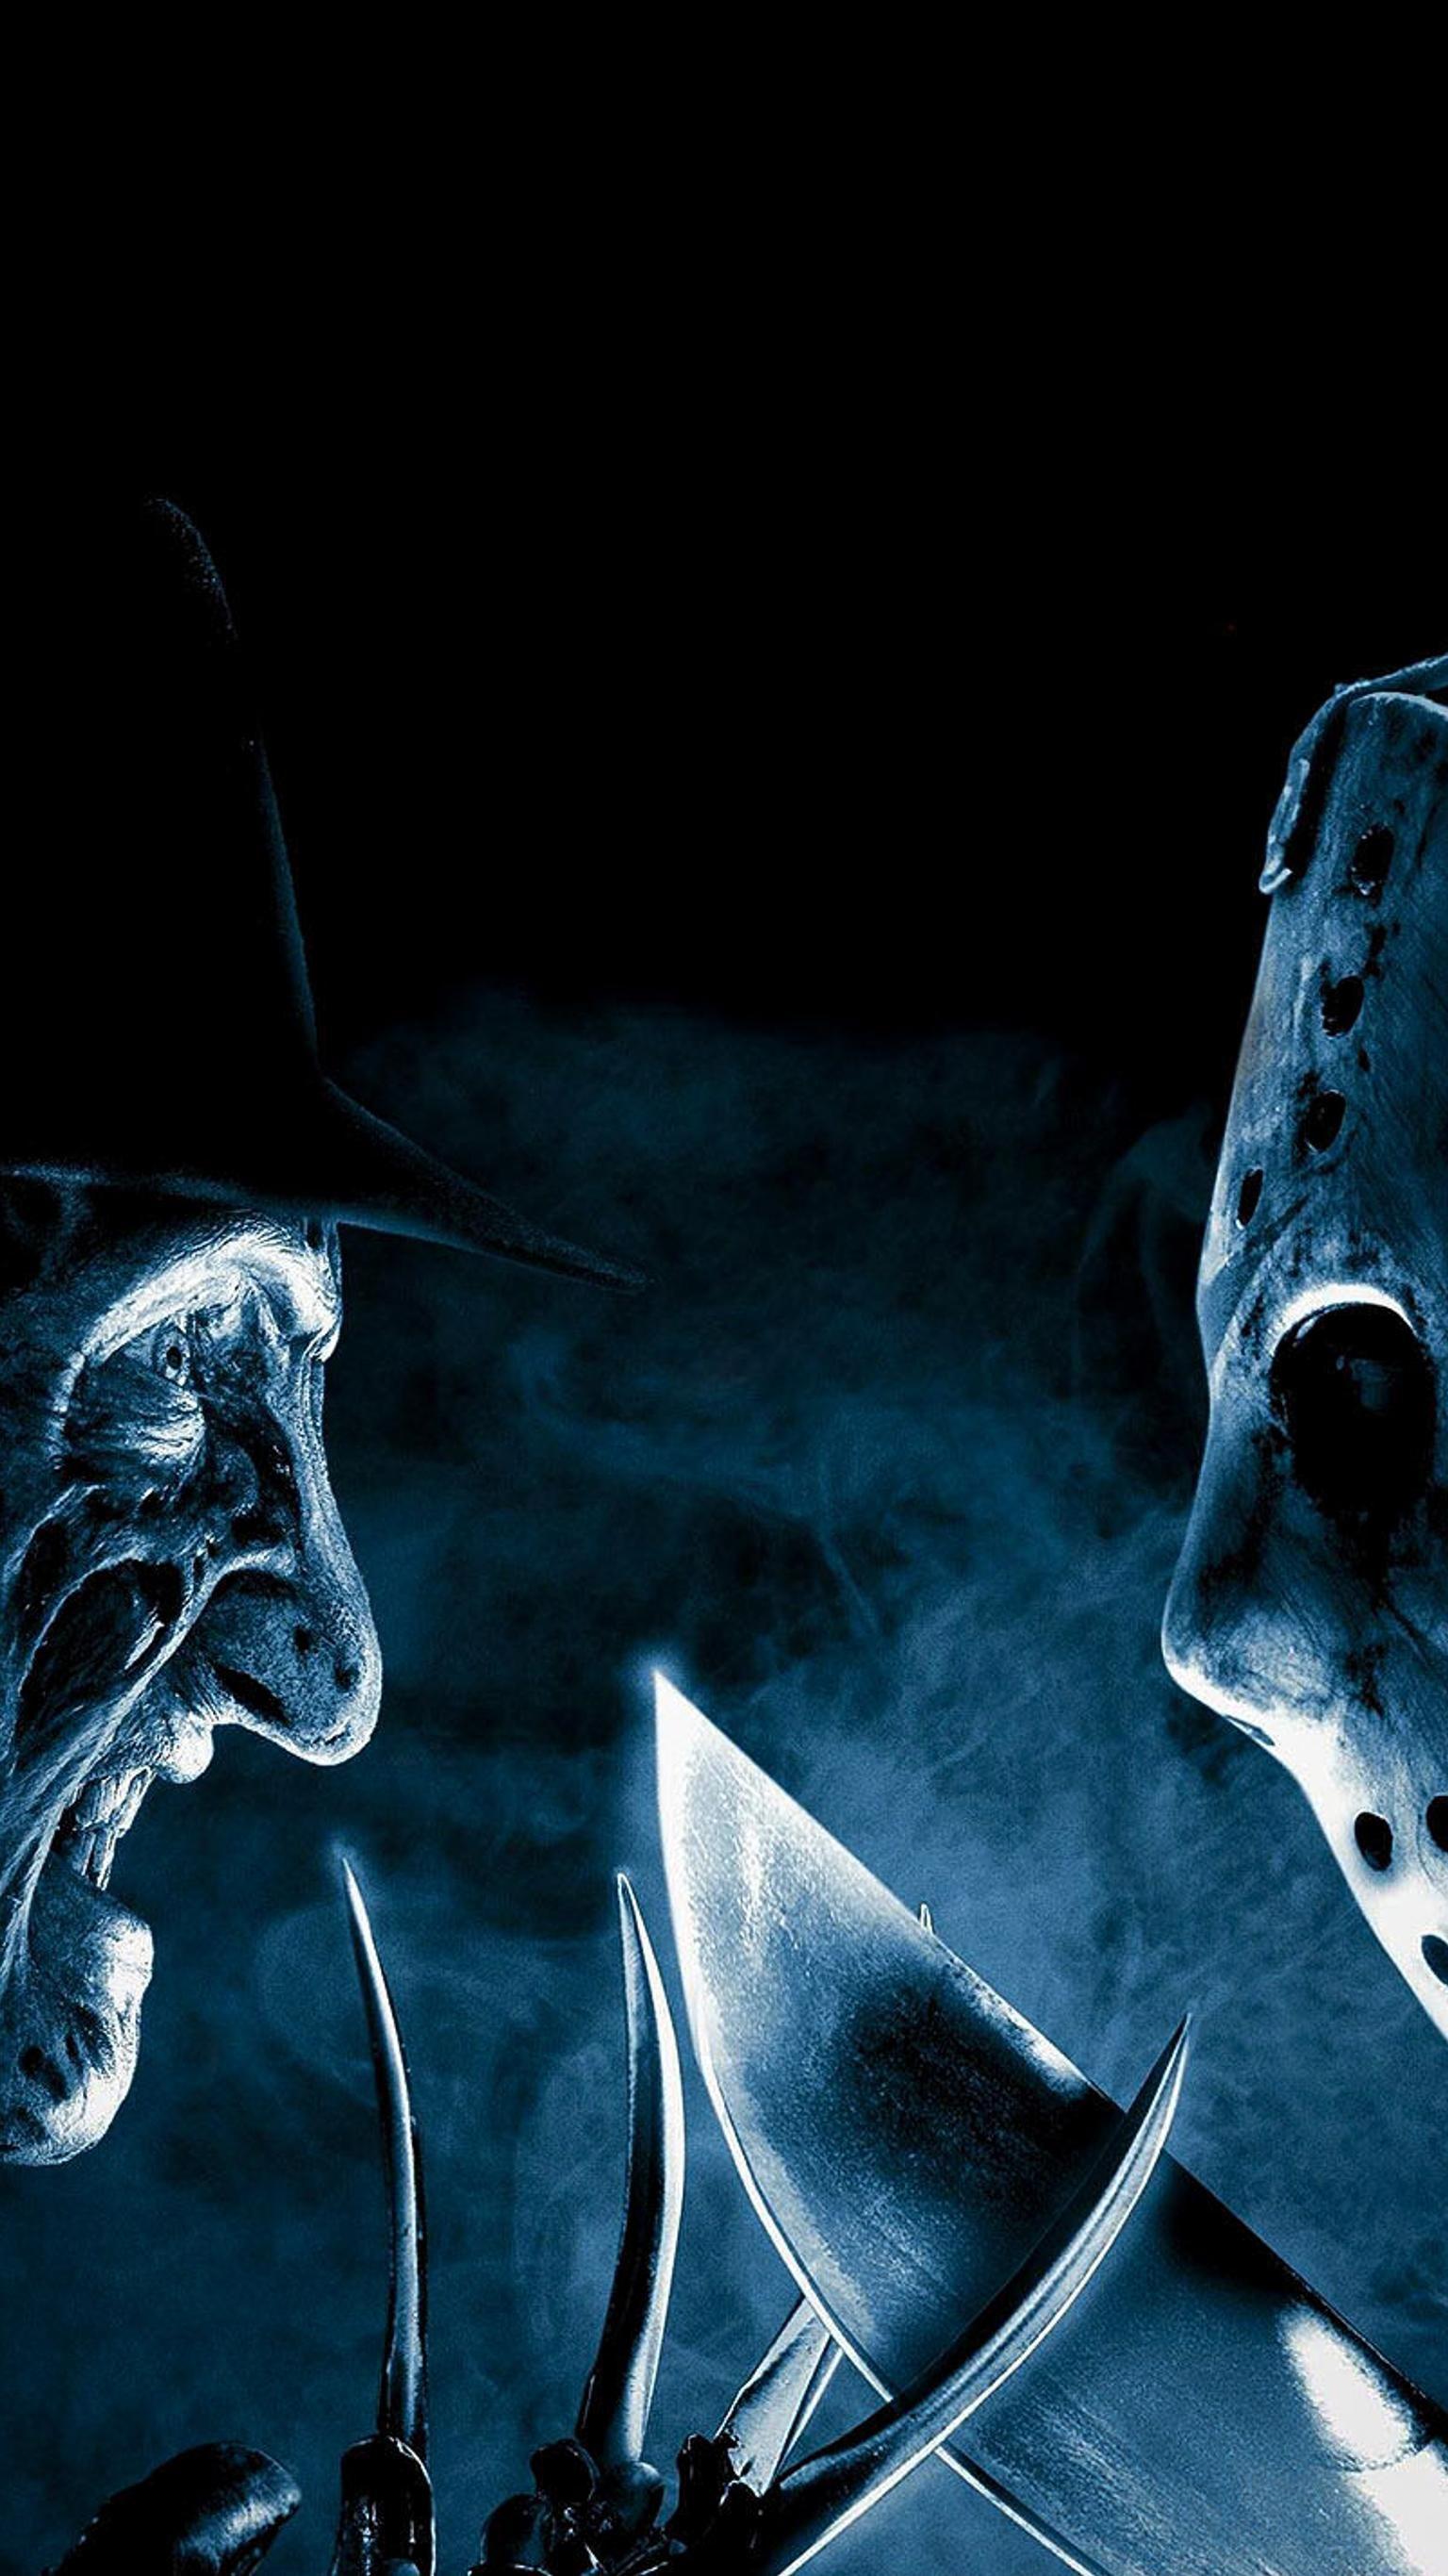 Freddy Vs Jason 2003 Phone Wallpaper In 2020 Scary